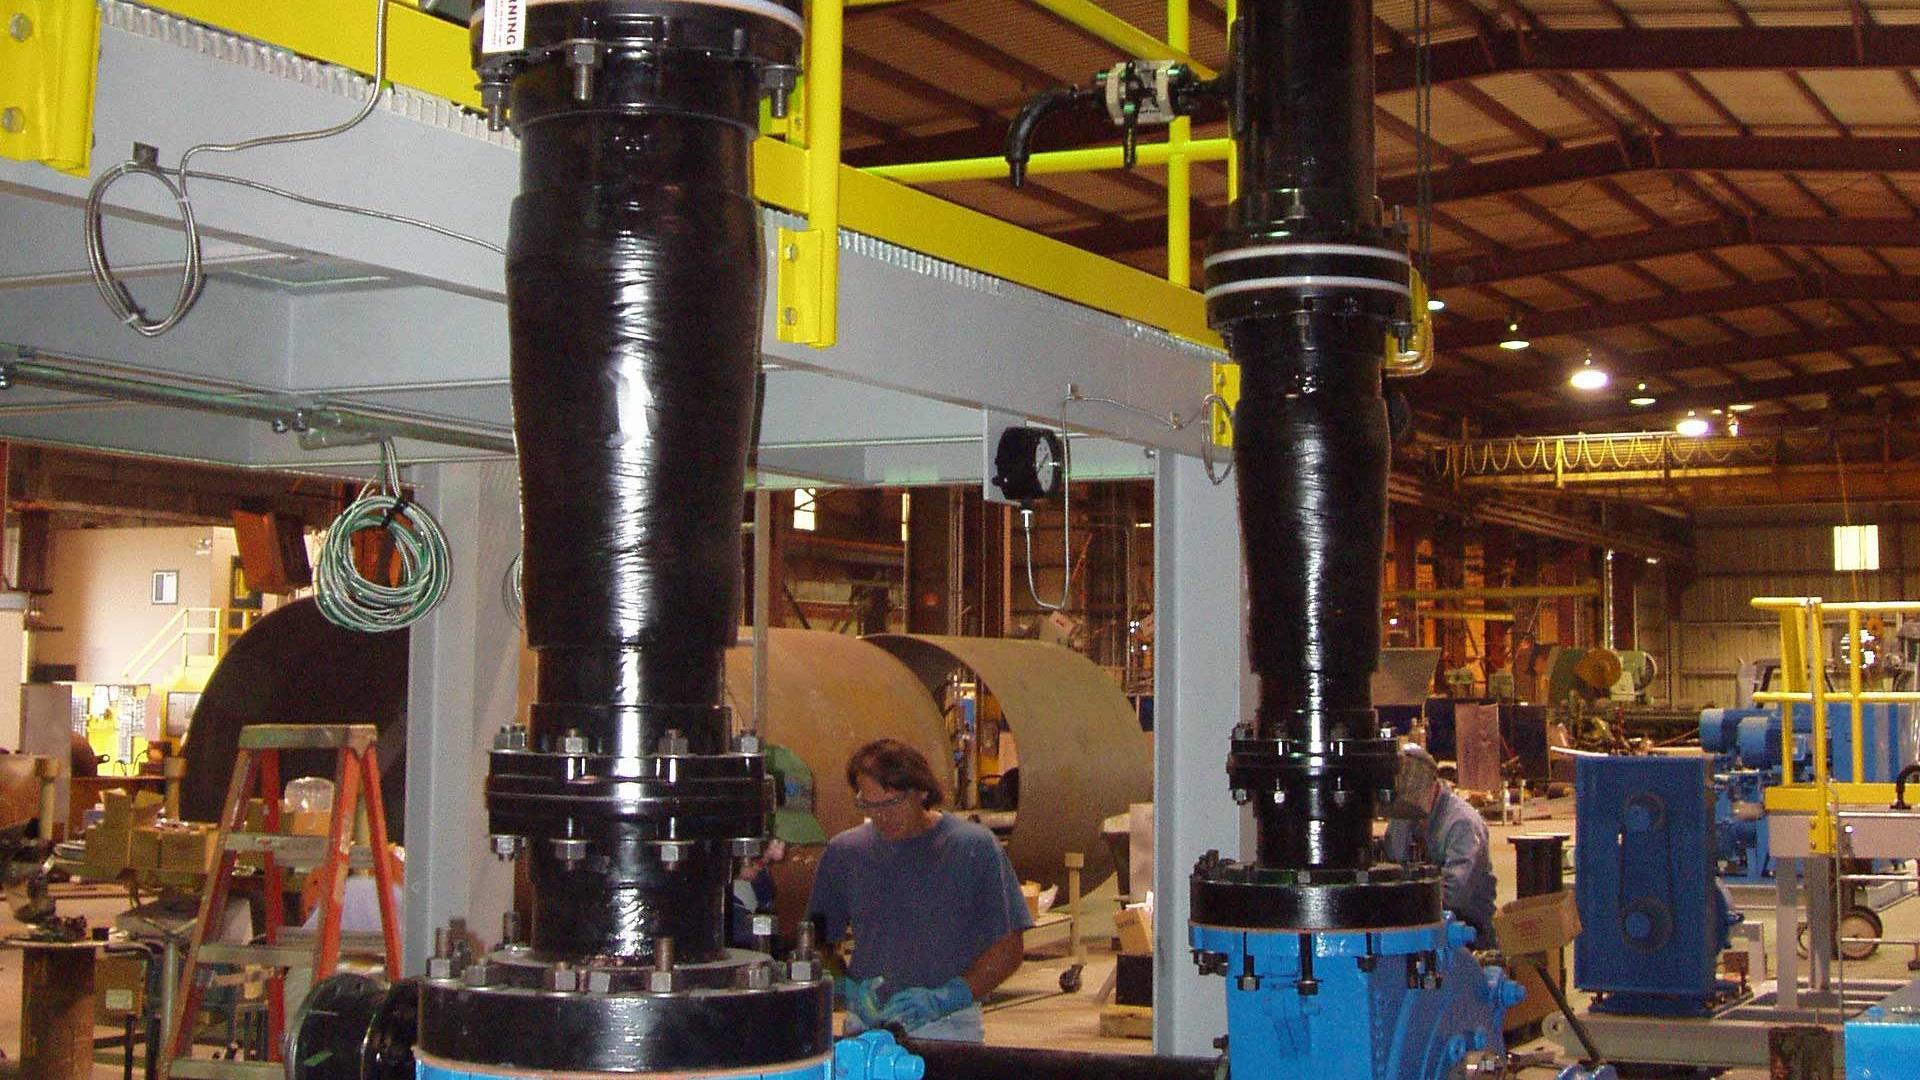 Two black Silver Streak Fiberglass Pipes in a manufacturing facility